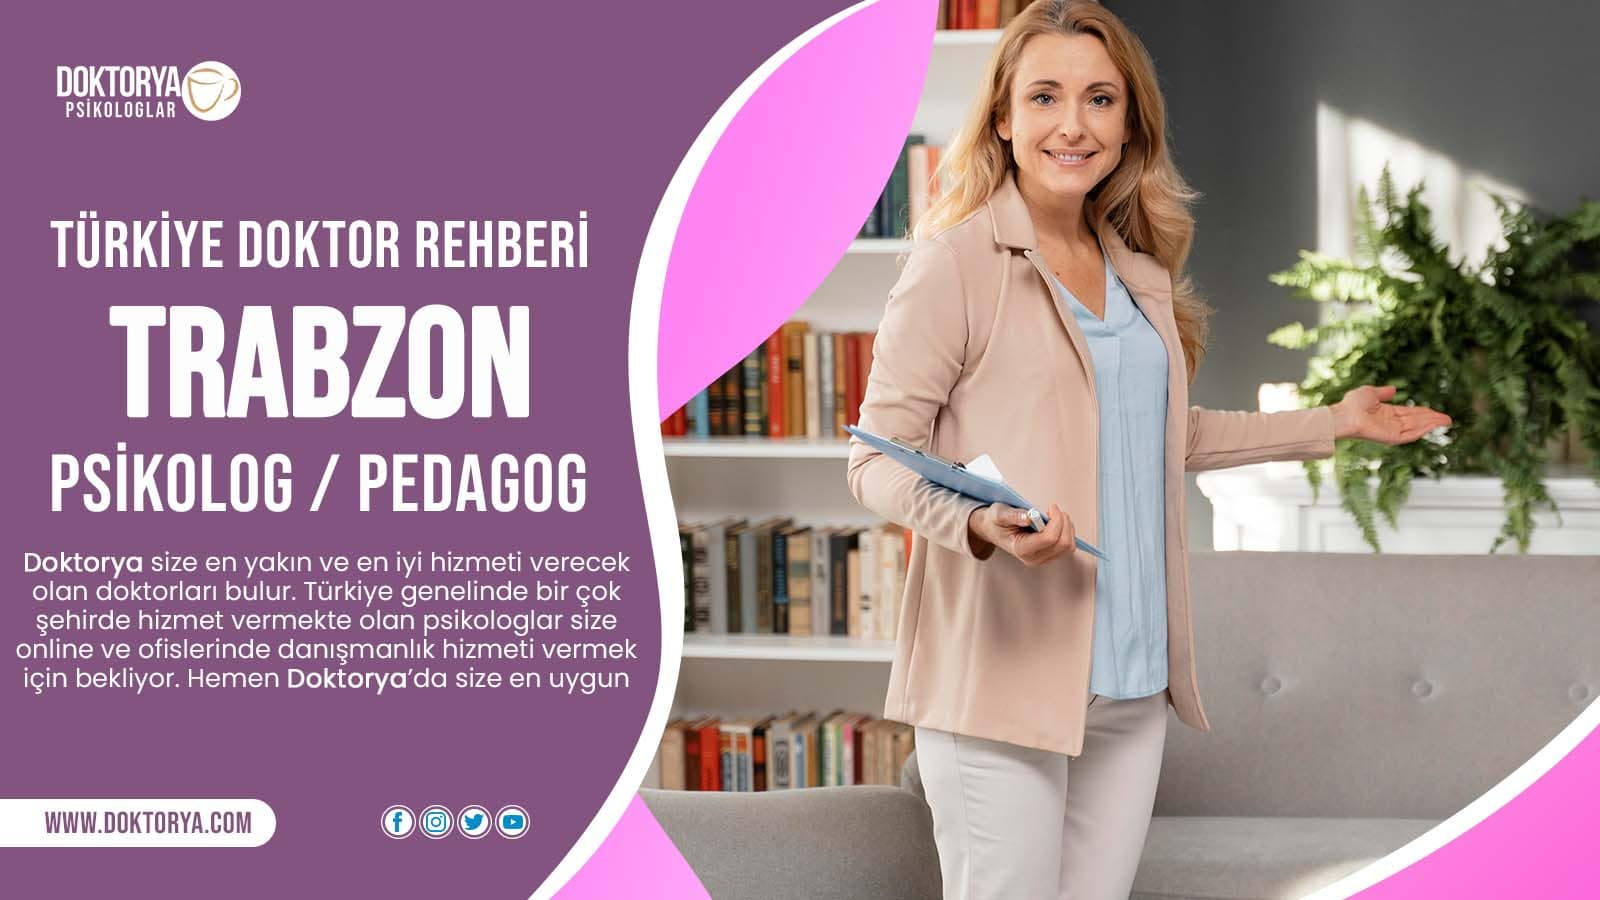 Trabzon Psikolog